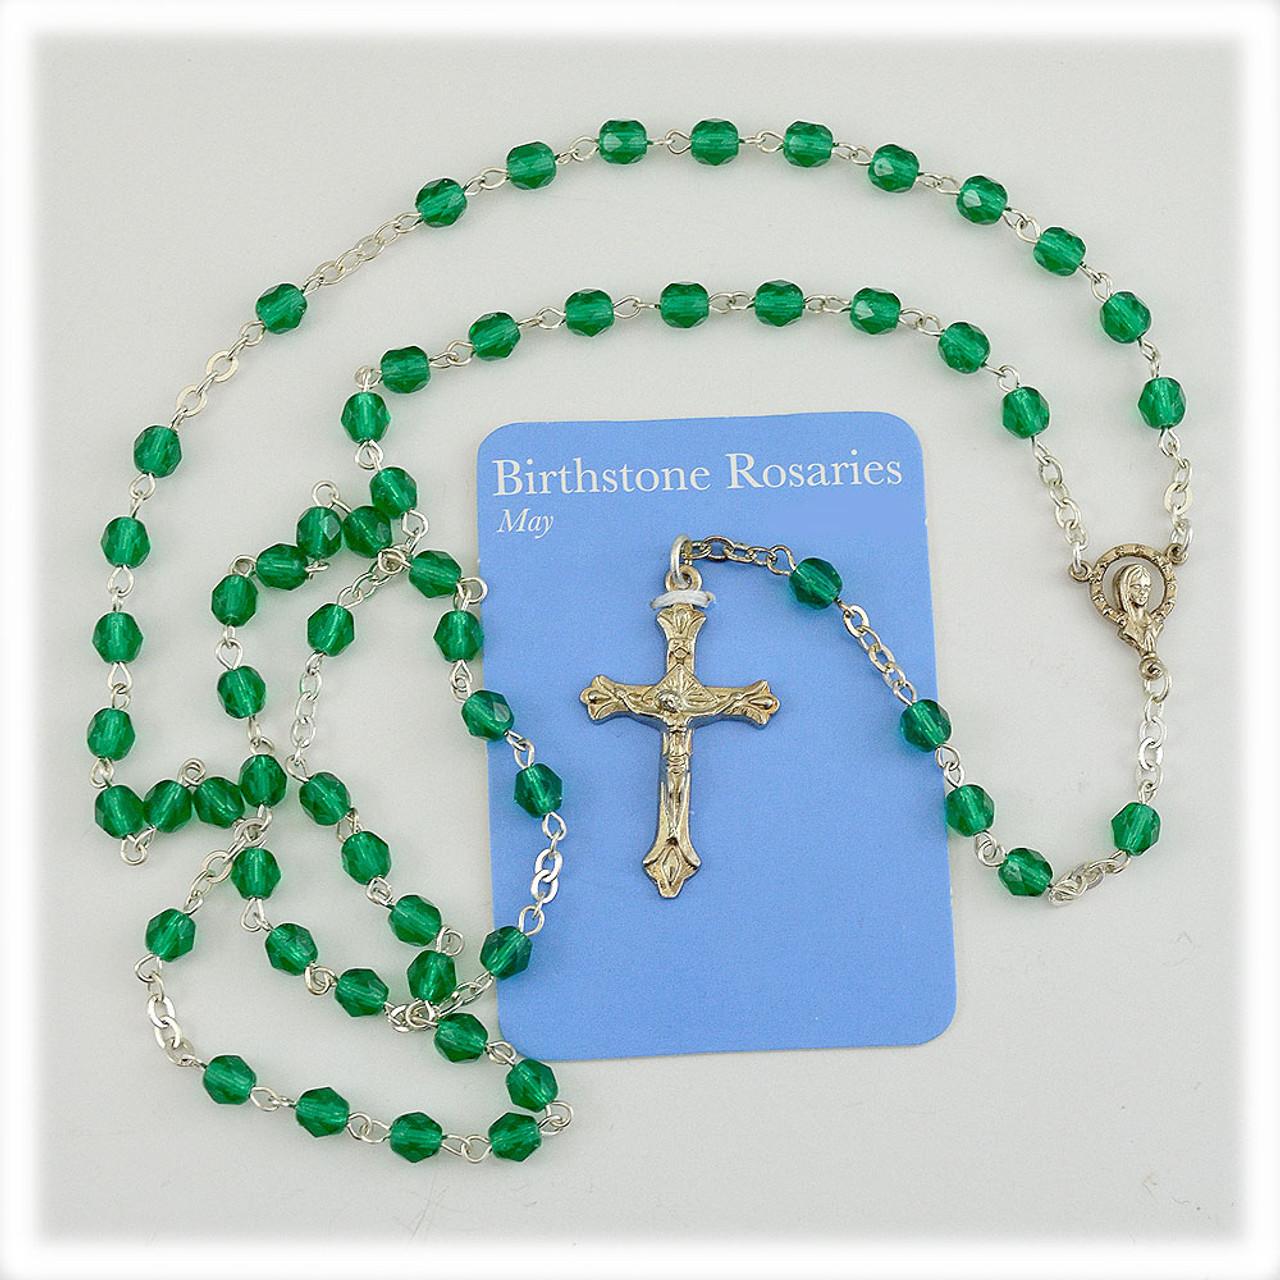 4mm Glass Birthstone Rosaries